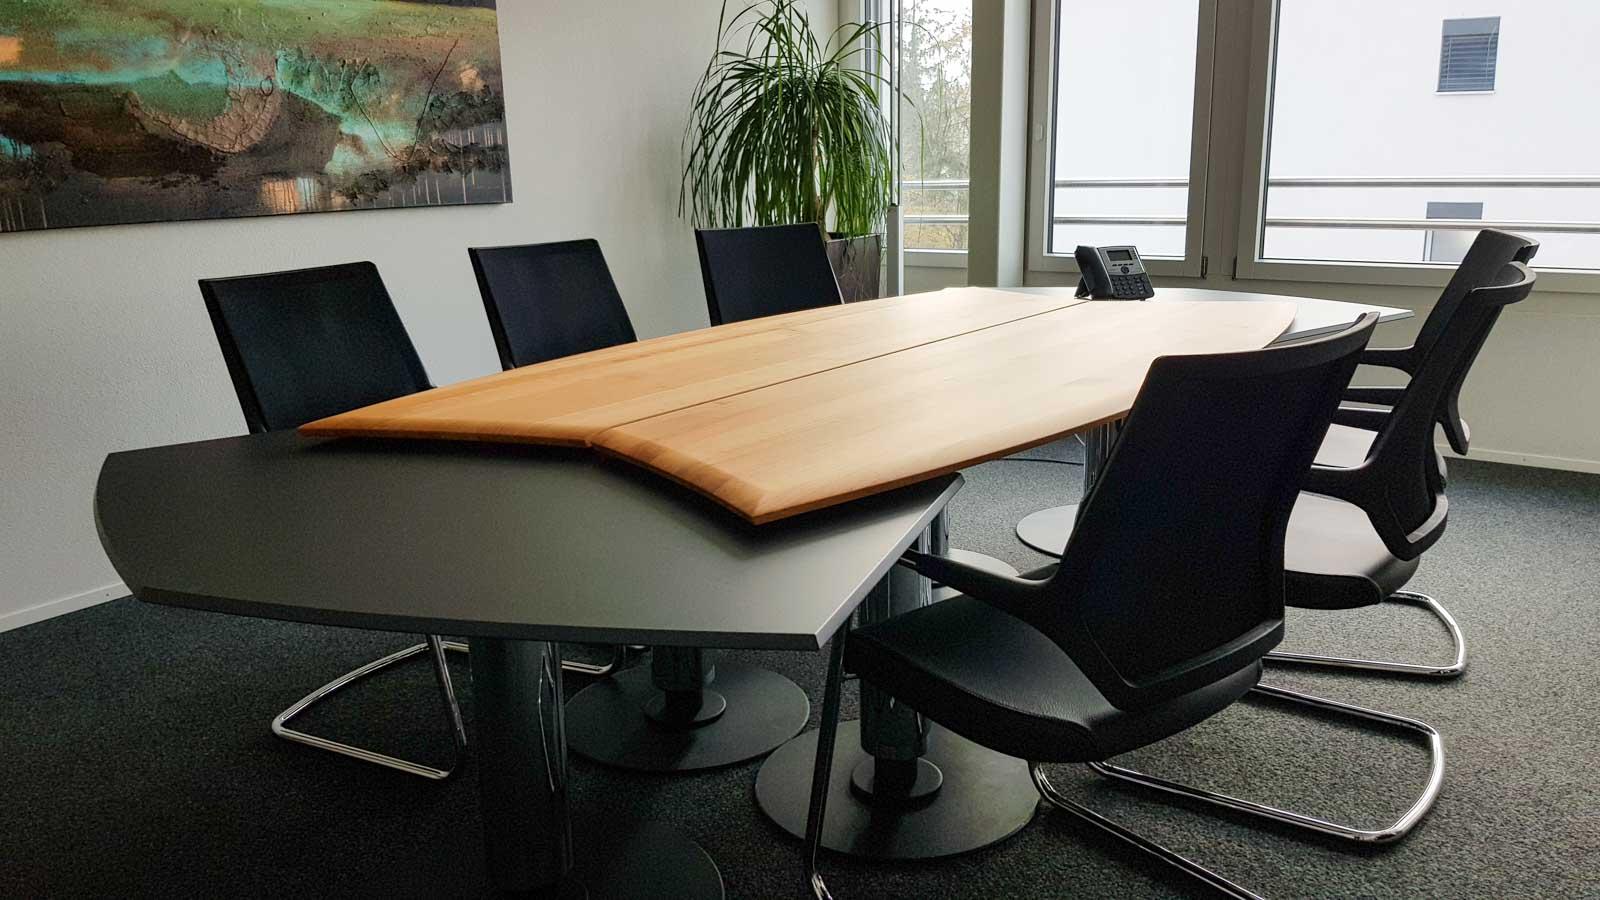 Wooddesign_Besprechungstisch_Sitzungstisch_Holz_Dunkel (2)